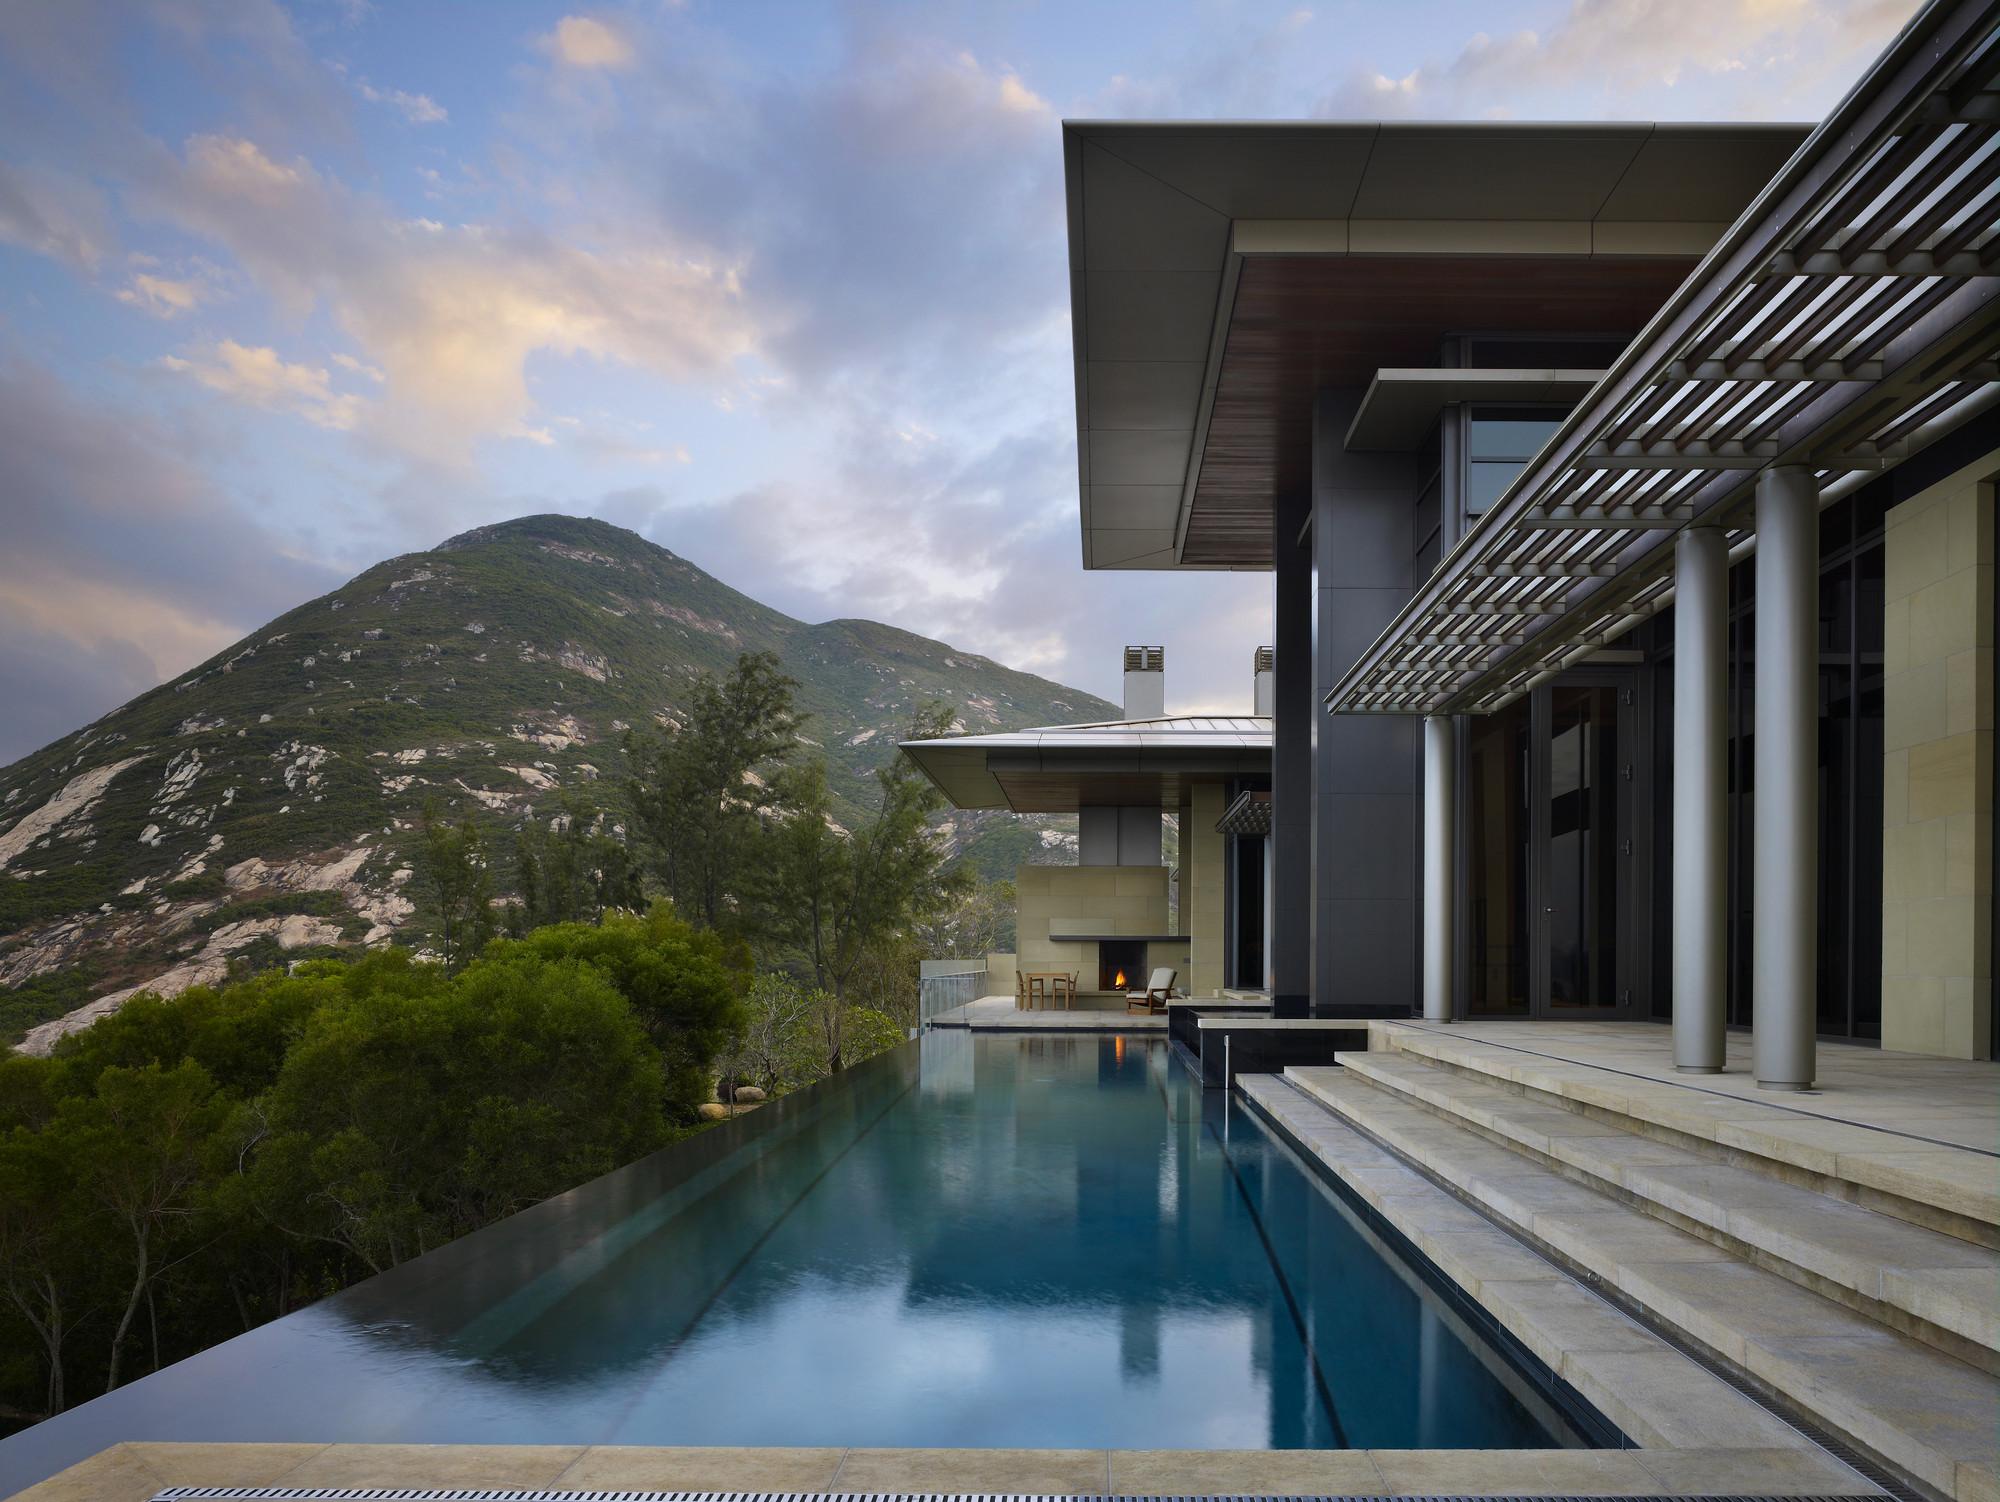 Hong Kong Villa, Chek-O, China © Benjamin Benschneider